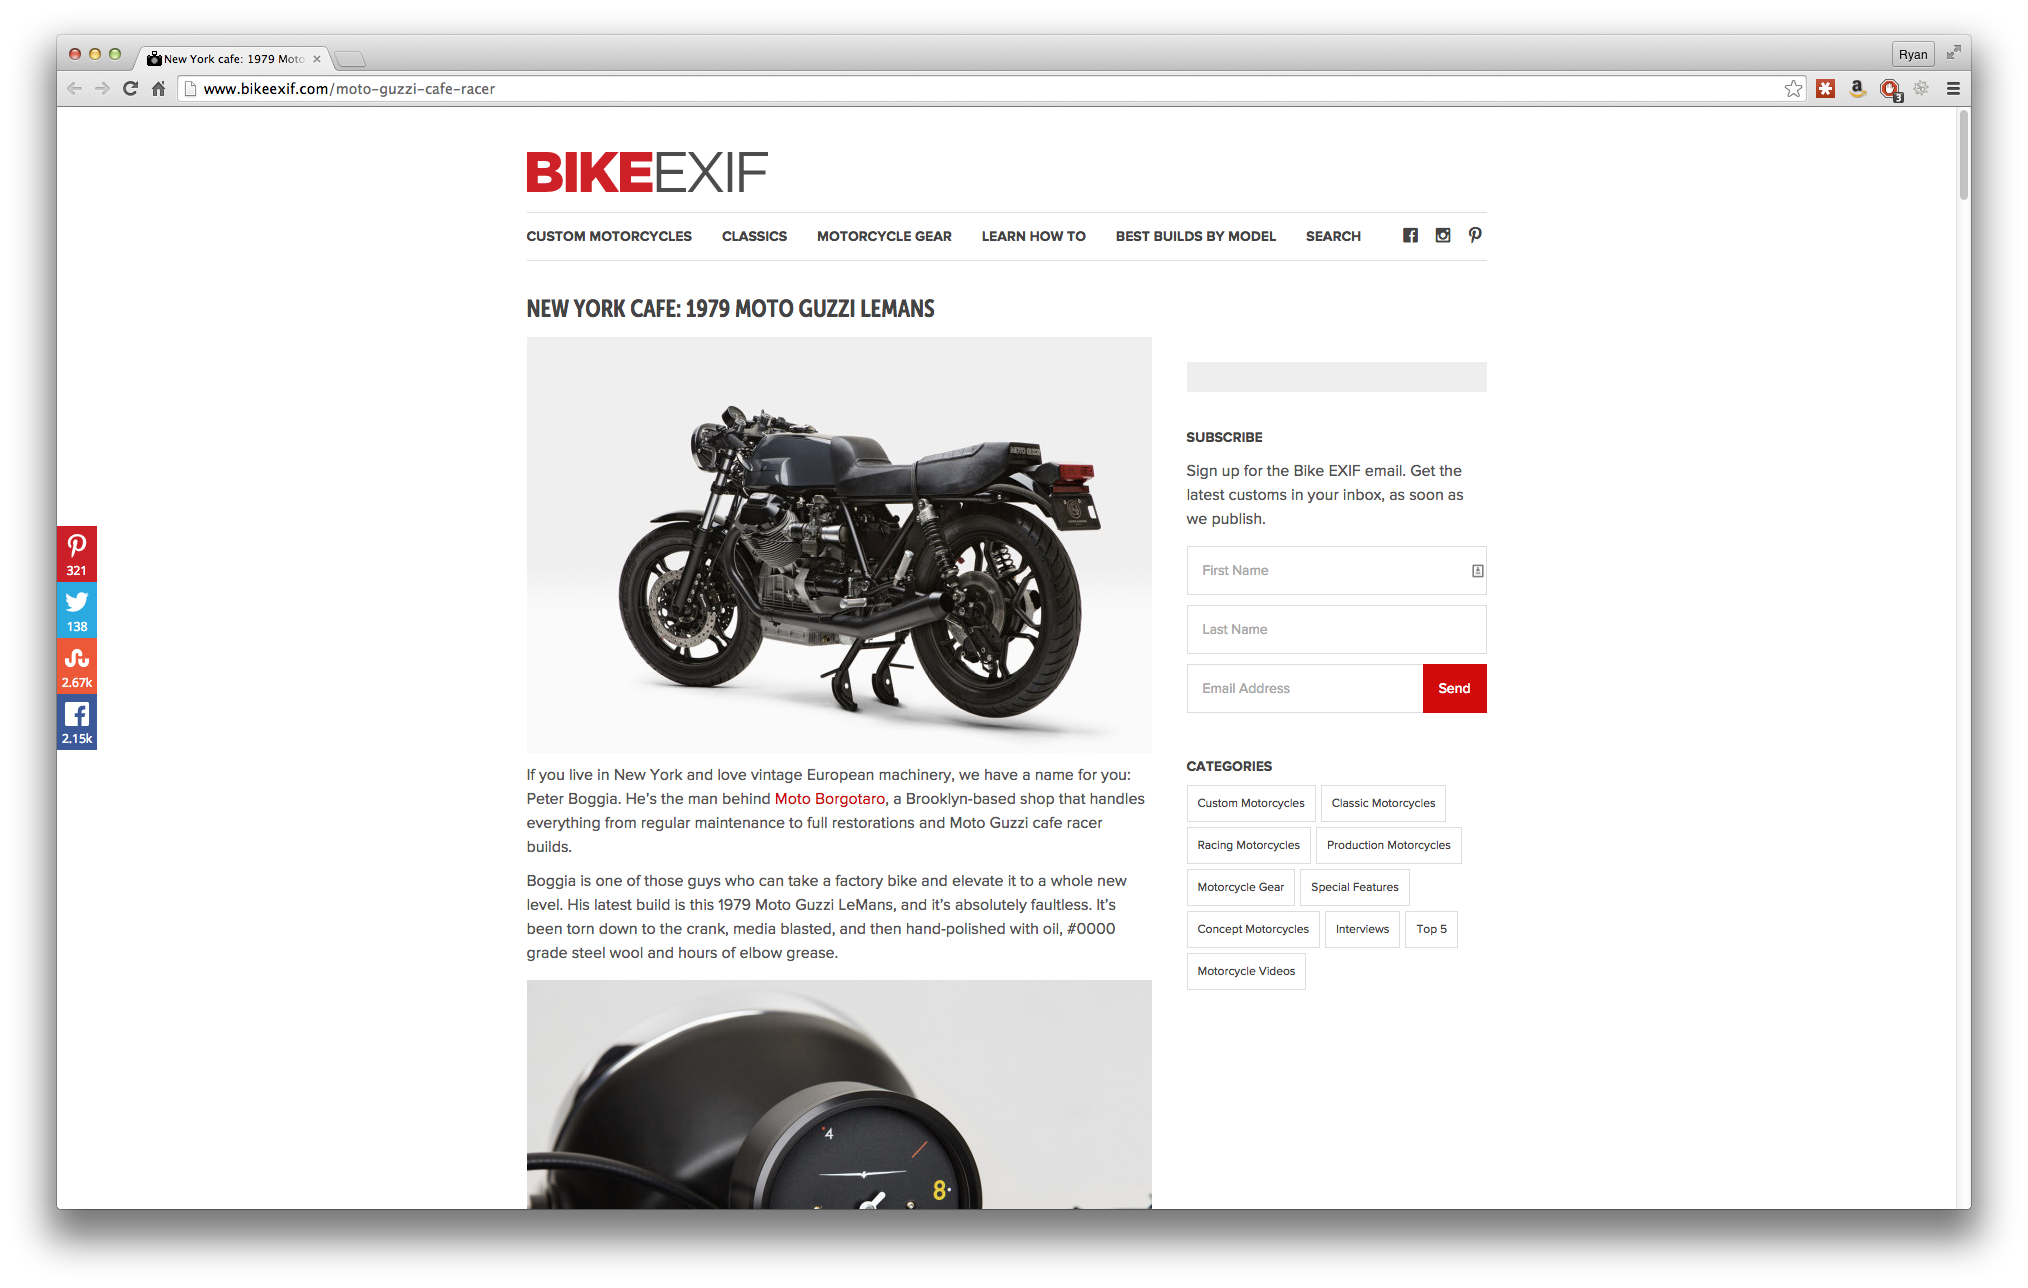 Bike Exif Moto Guzzi Lemans 79.png